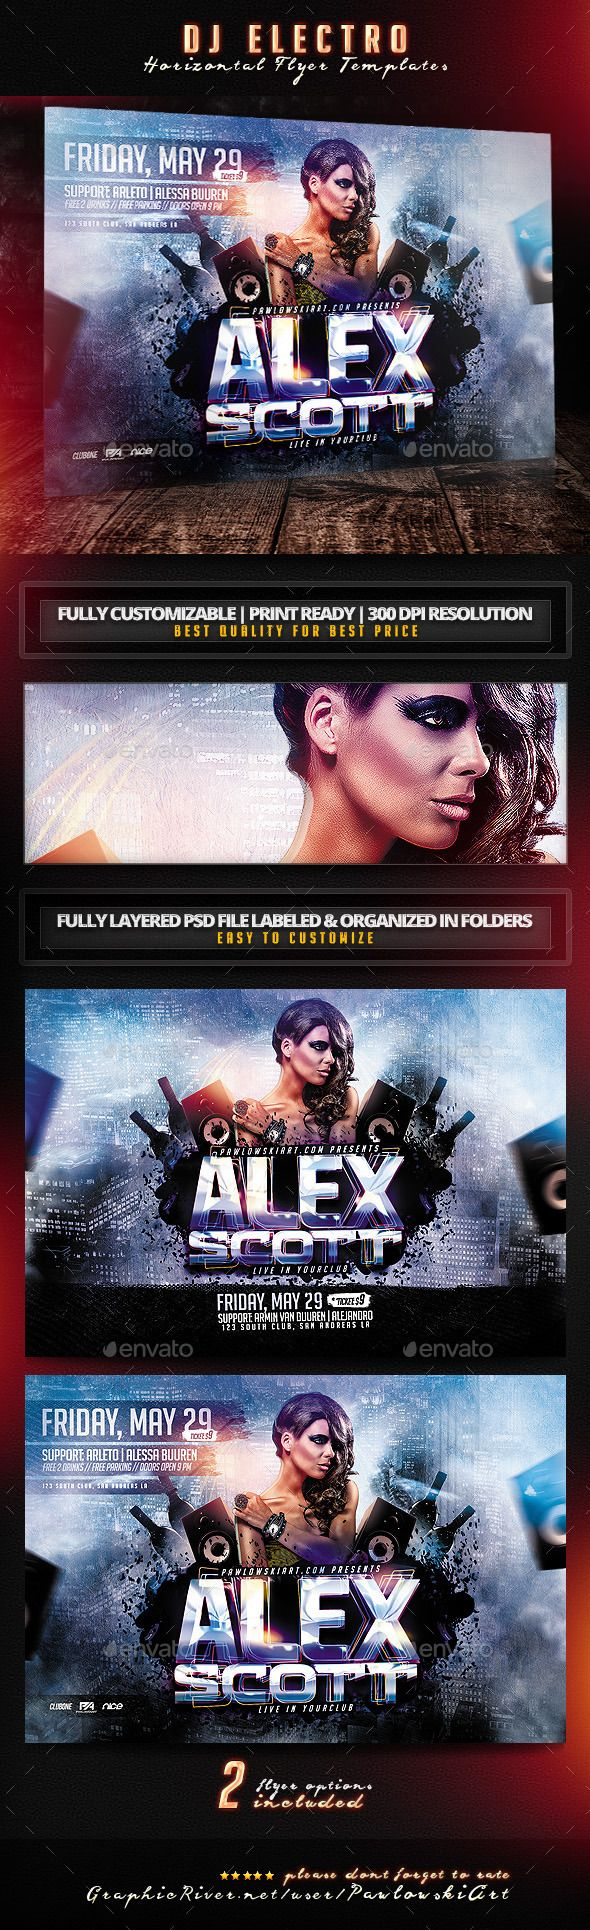 DJ Electro Horizontal Flyer Templates - Clubs & Parties Events